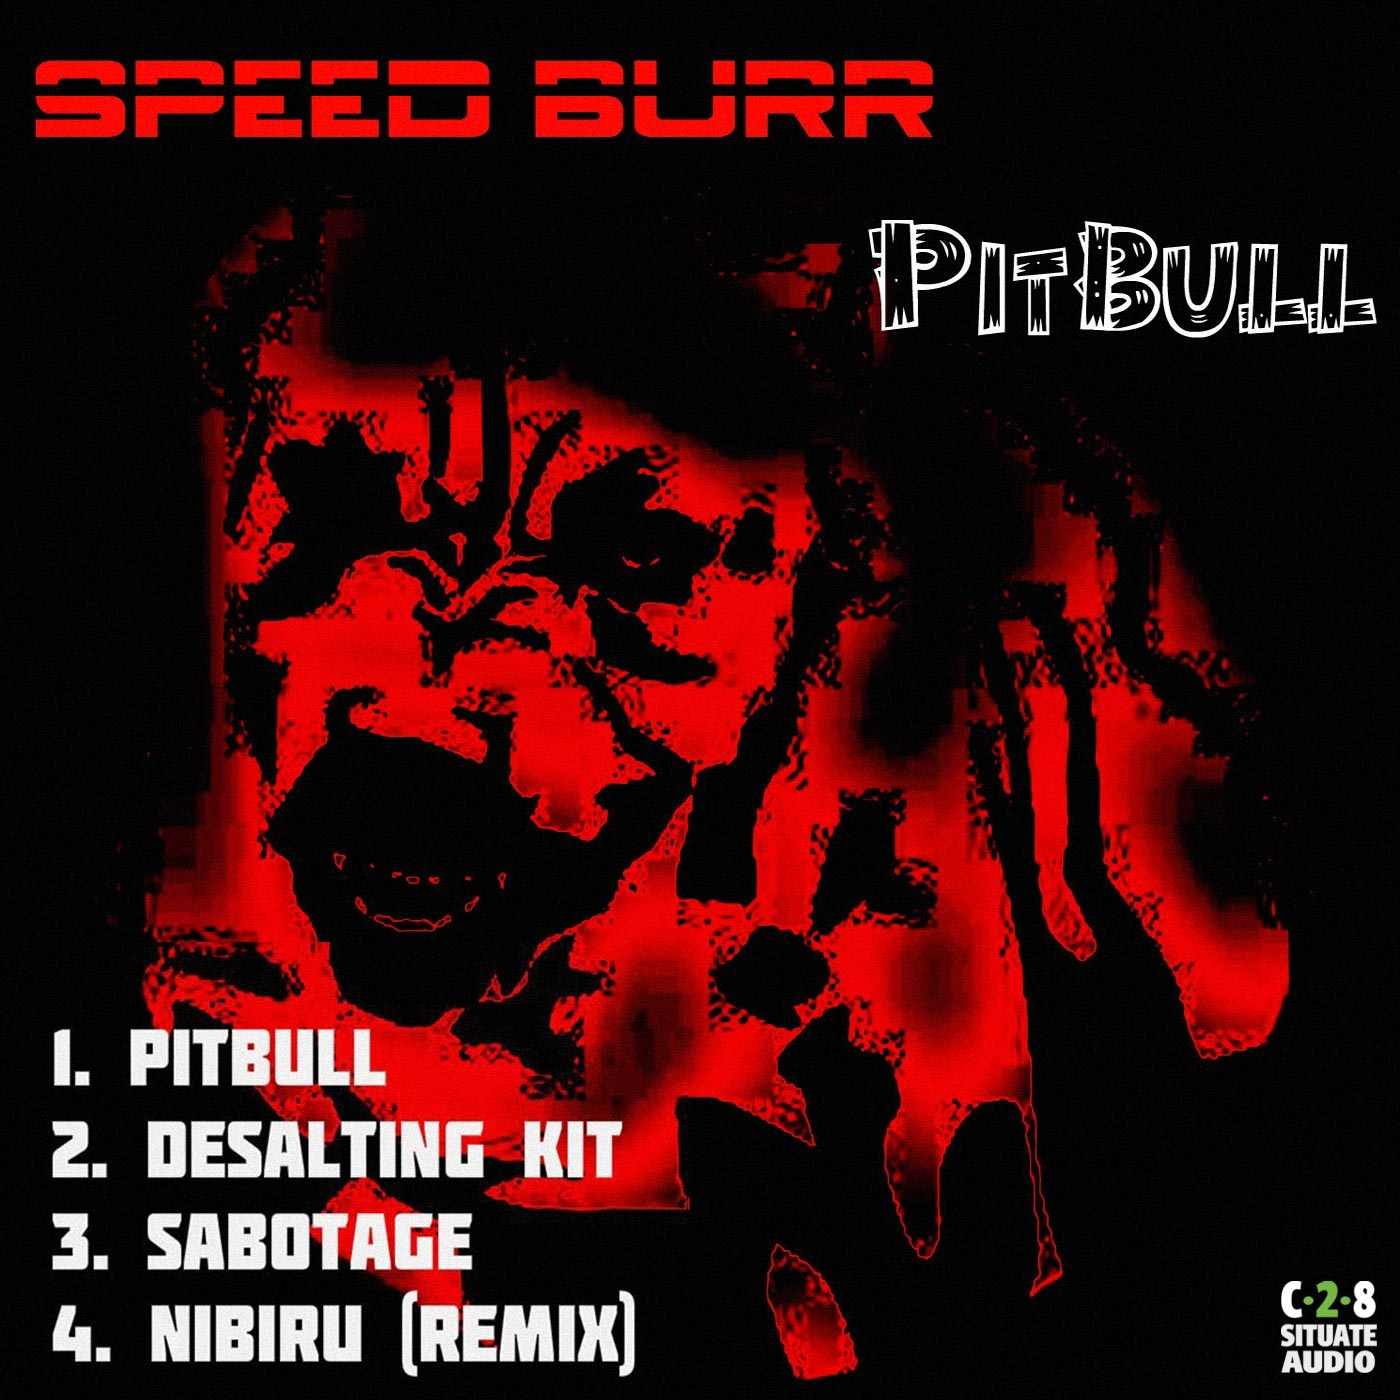 Speed Burr - Sabotage (Original Mix)